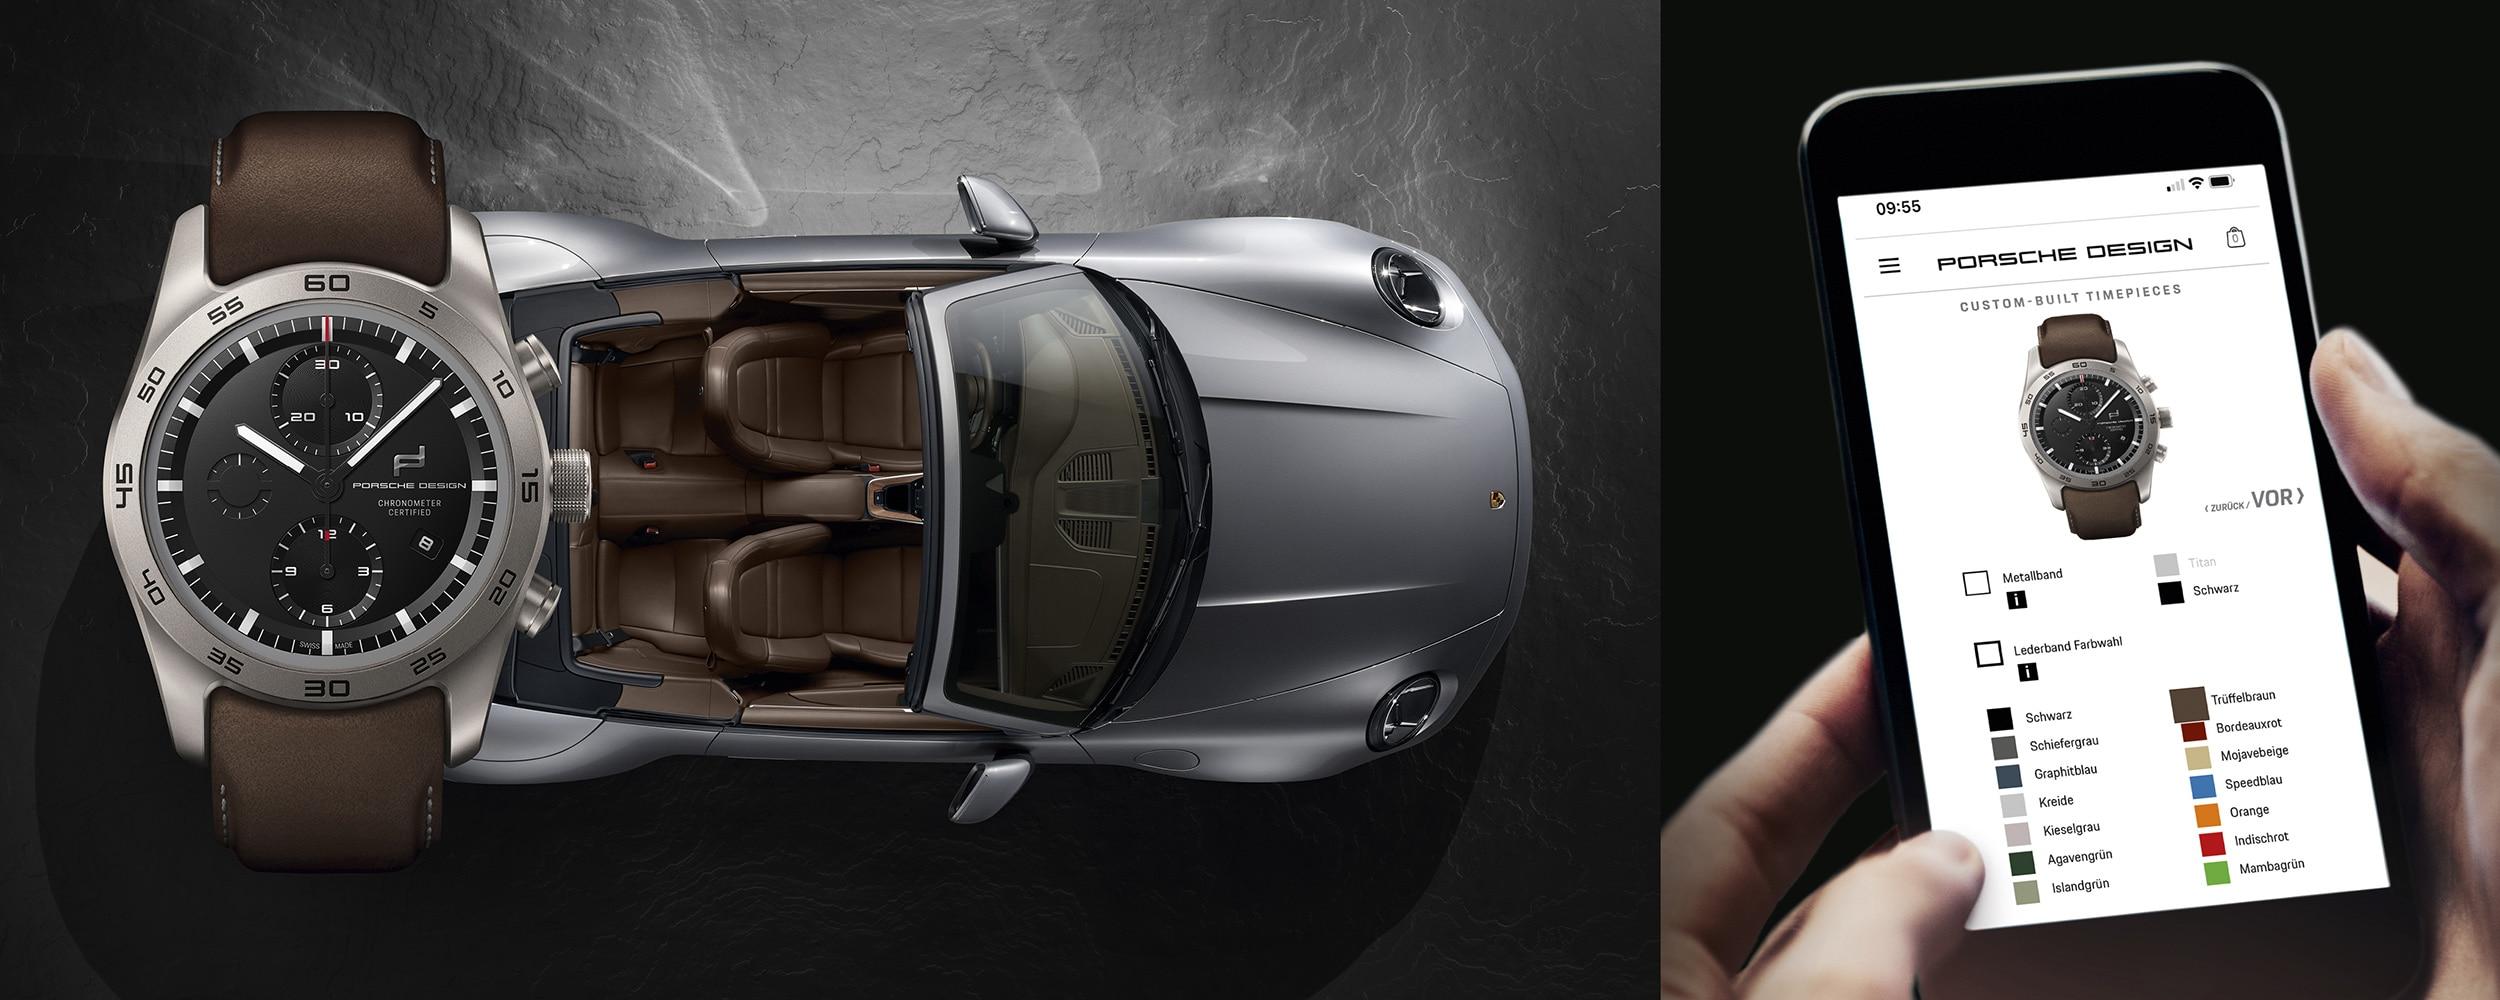 Porsche Design Uhren Konfigurator